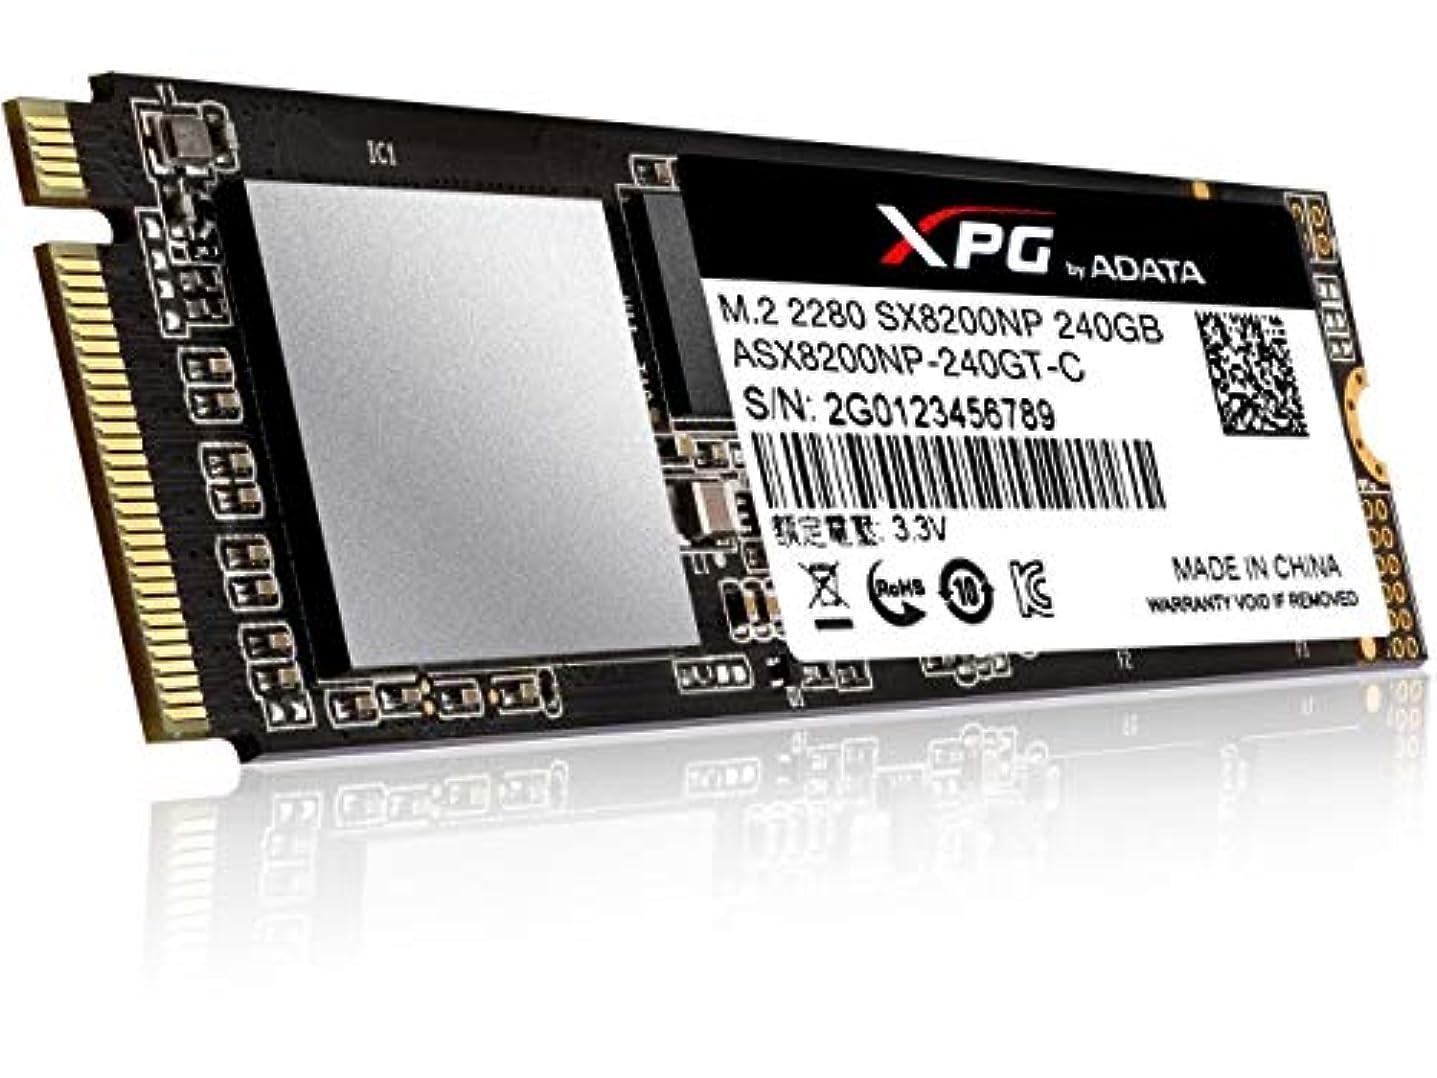 ピーブ郡硬化するADATA Technology XPG SX8200 PCIe Gen3x4 M.2 2280 SSD 240GB ASX8200NP-240GT-C